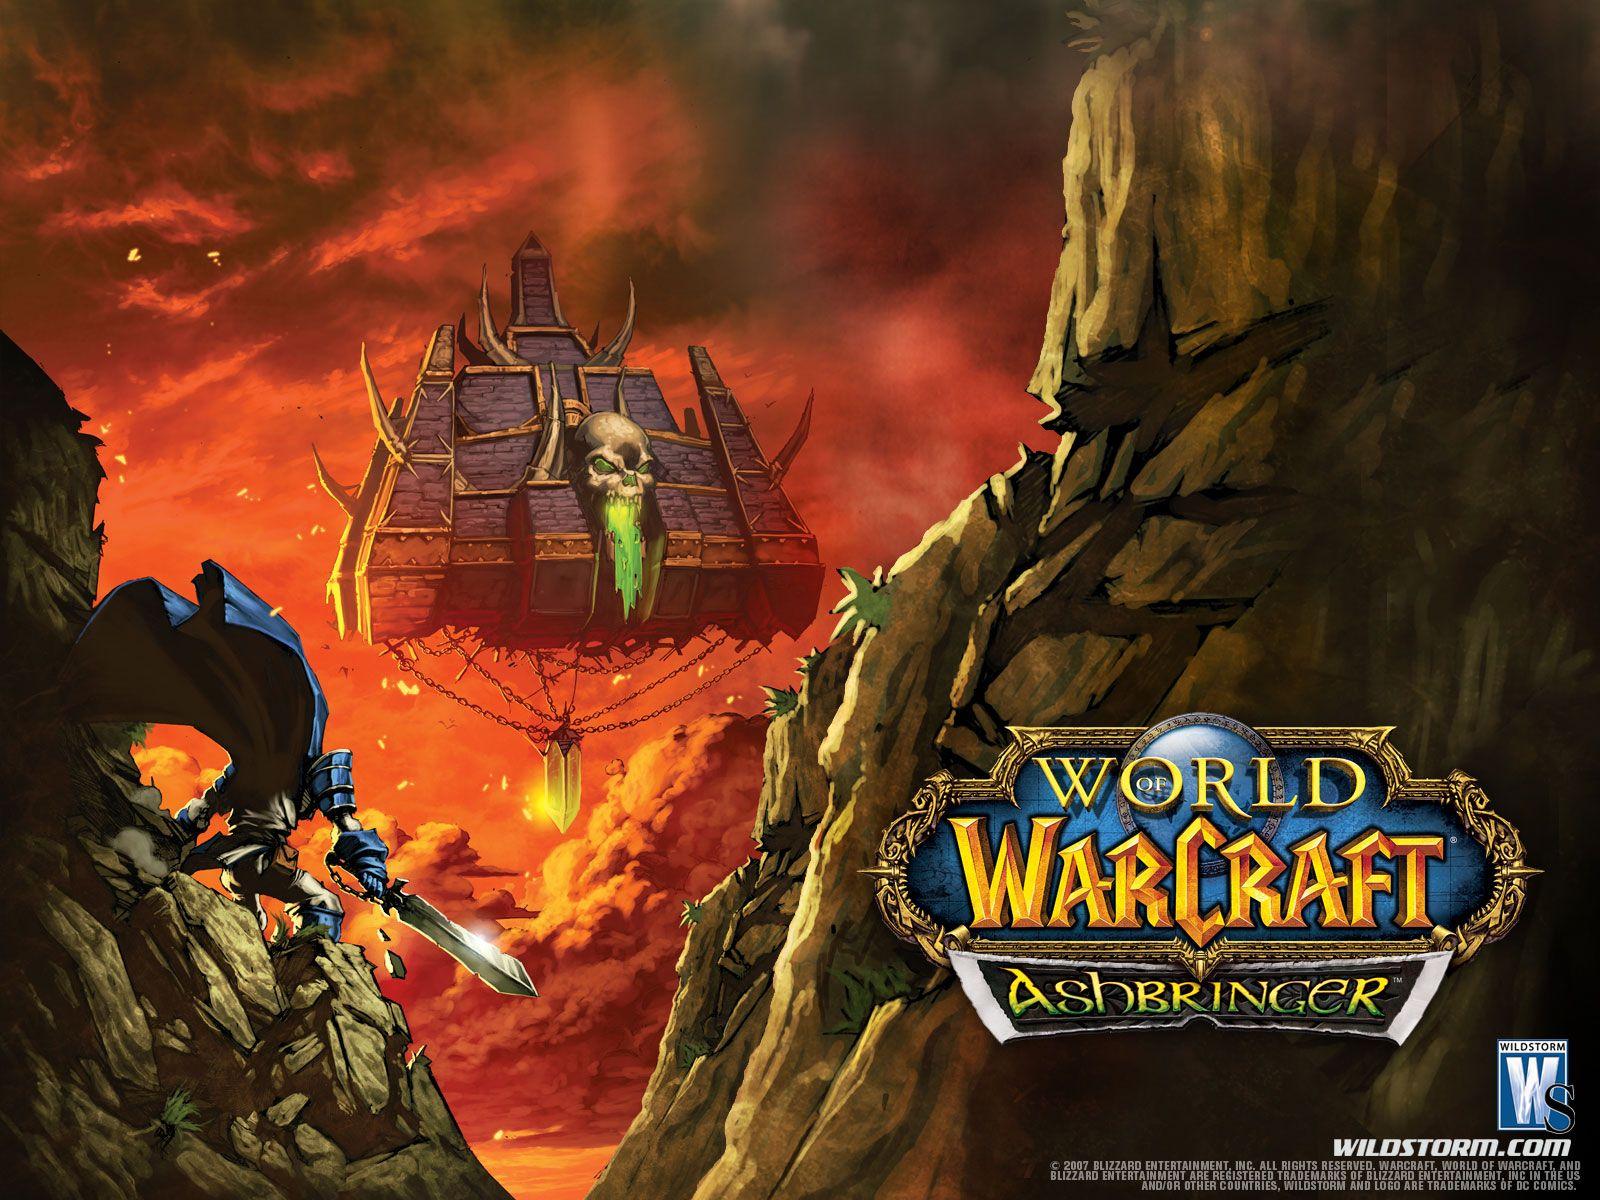 World Of Warcraft Ashbringer Wallpaper Awesome World Of Warcraft Images Online World Of Warcraft Legion